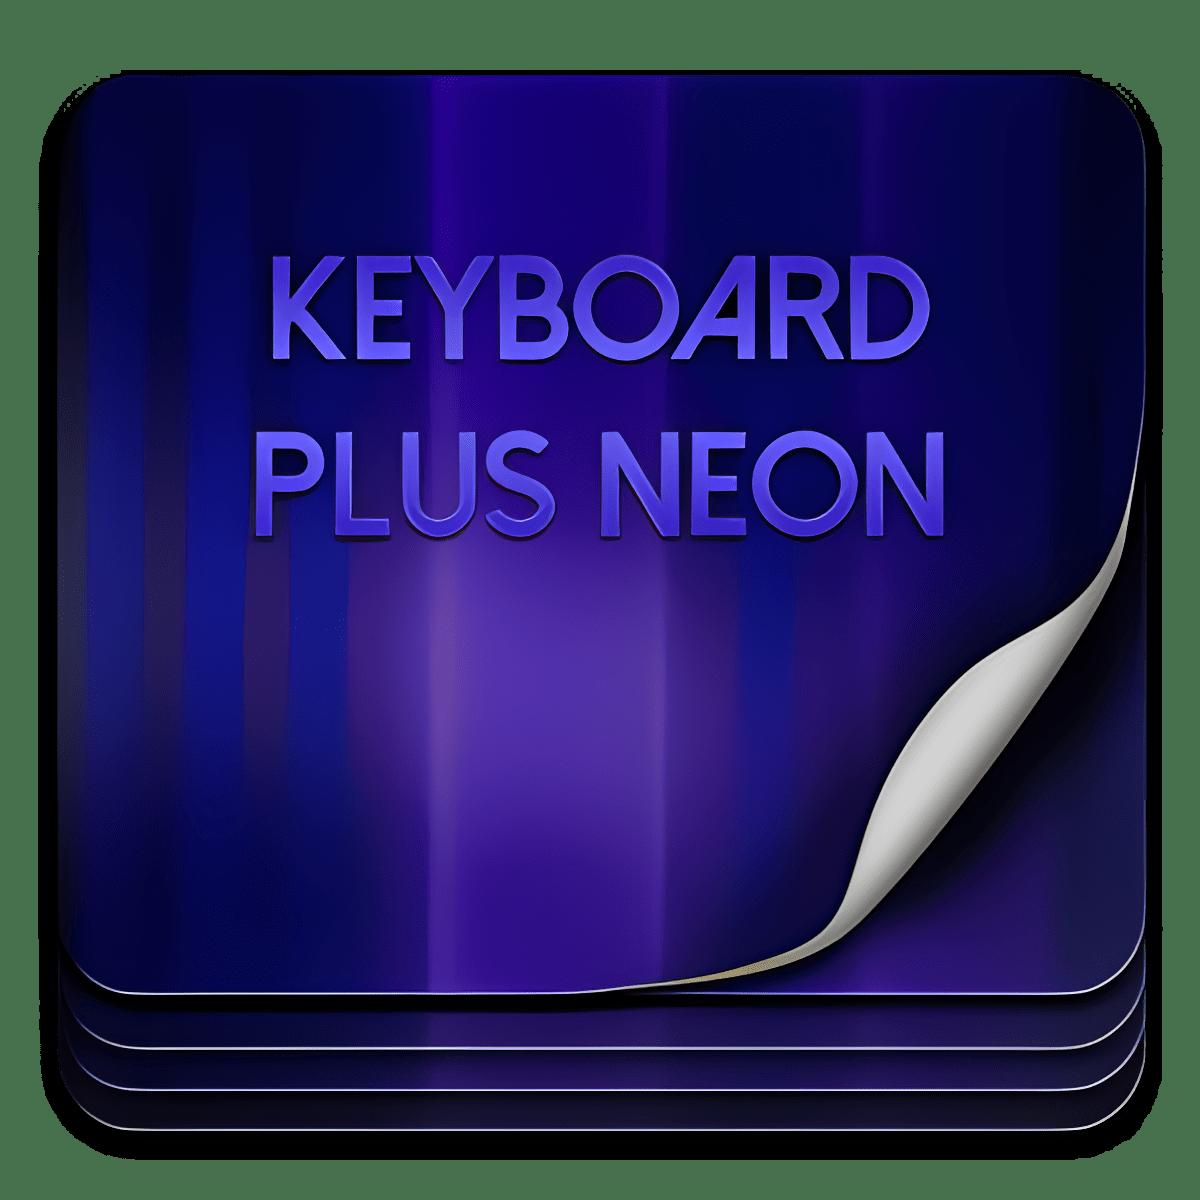 Keyboard Plus Neon